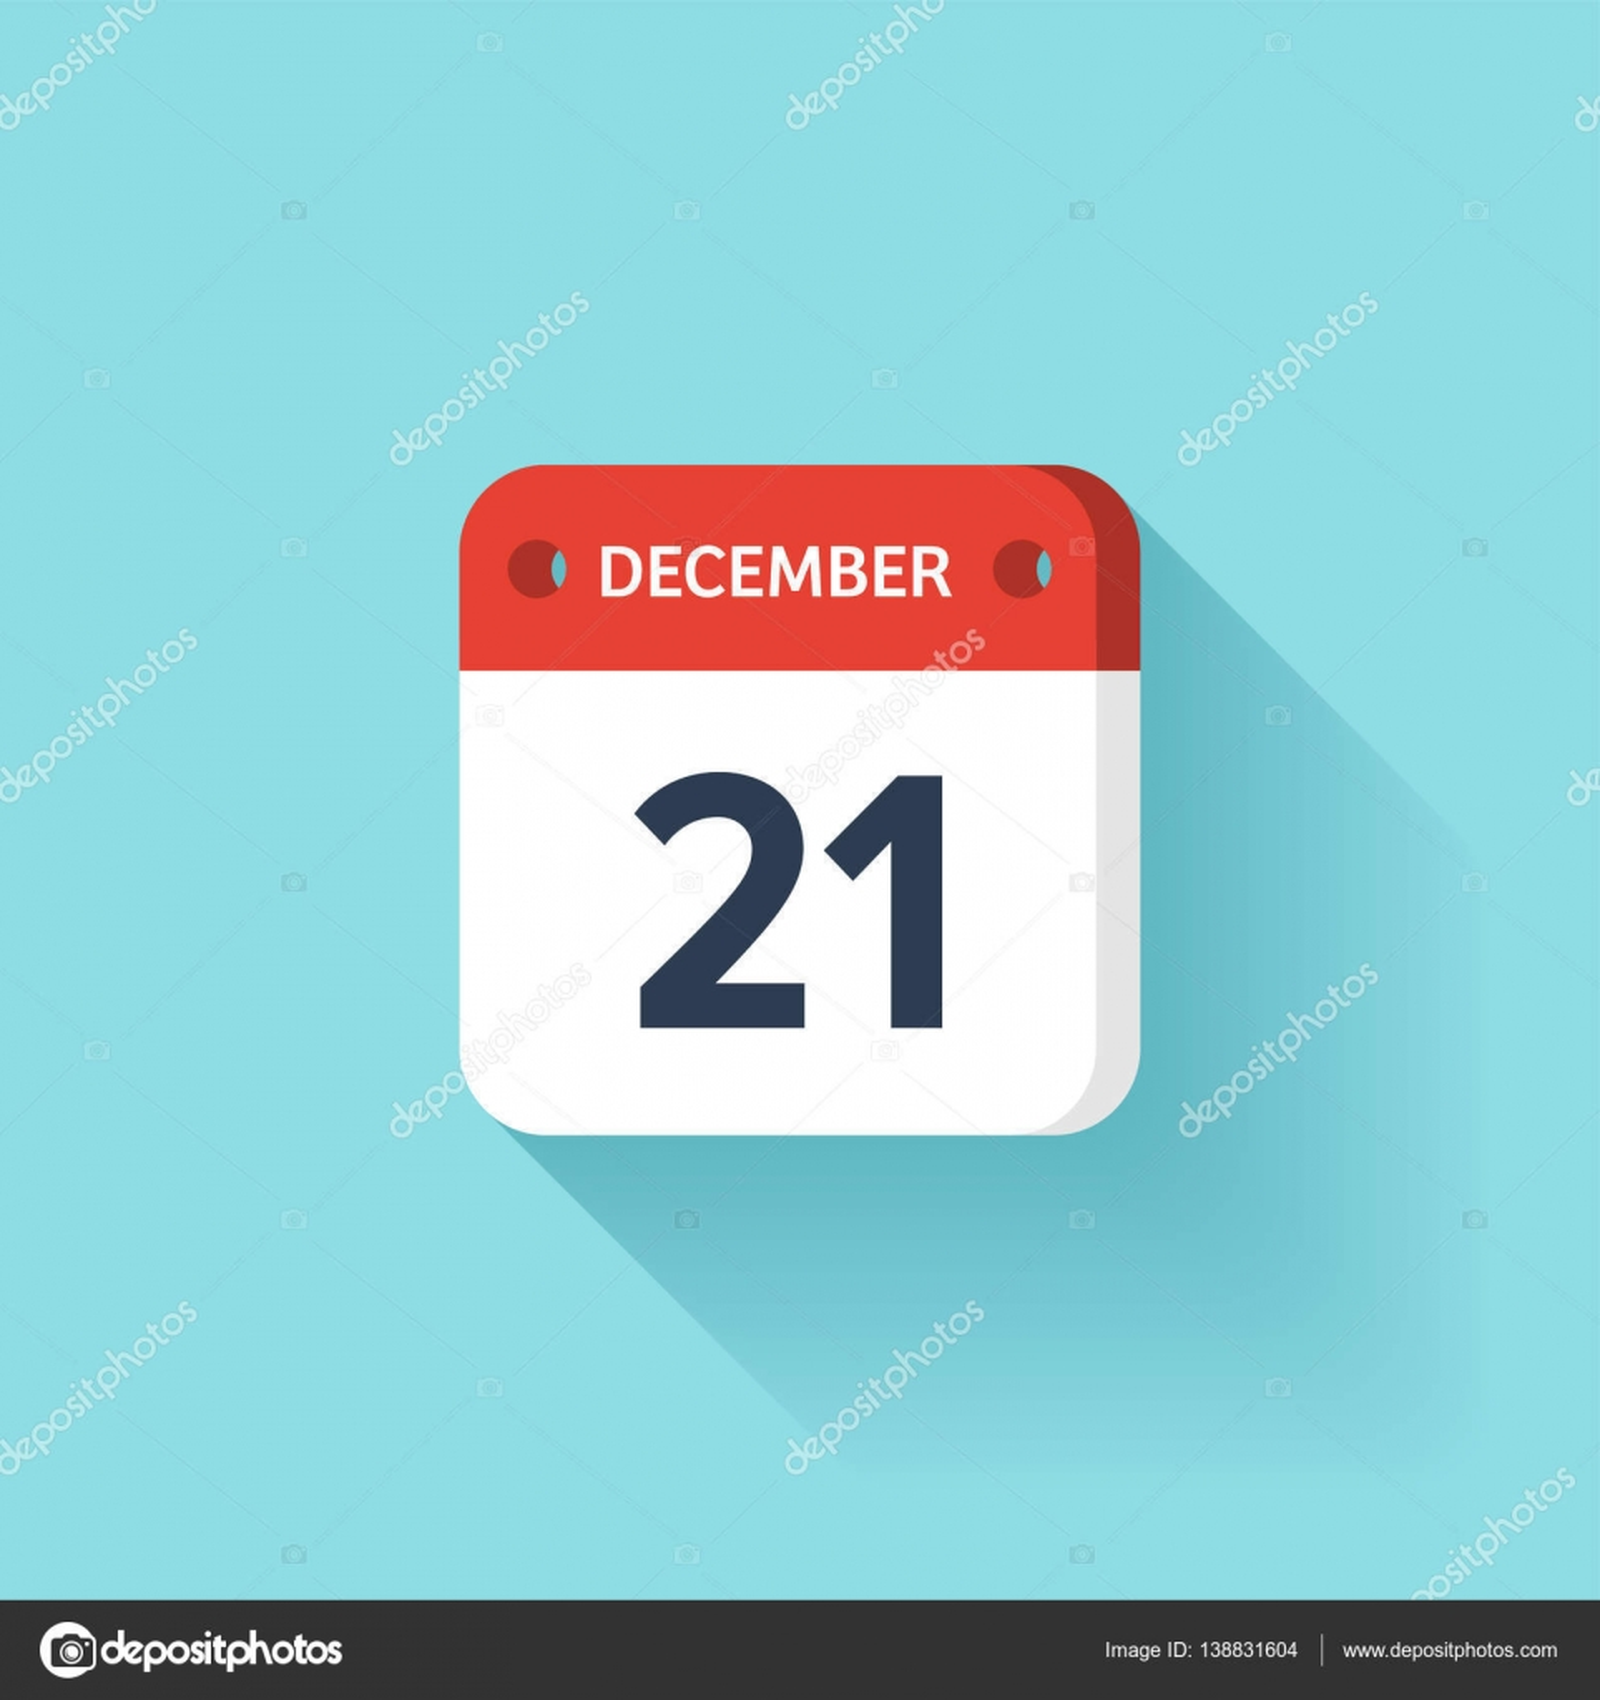 December 21 Isometric Calendar Icon With ShadowVector IllustrationFlat StyleMonth And DateSundayMondayTuesdayWednesdayThursdayFriday Saturday